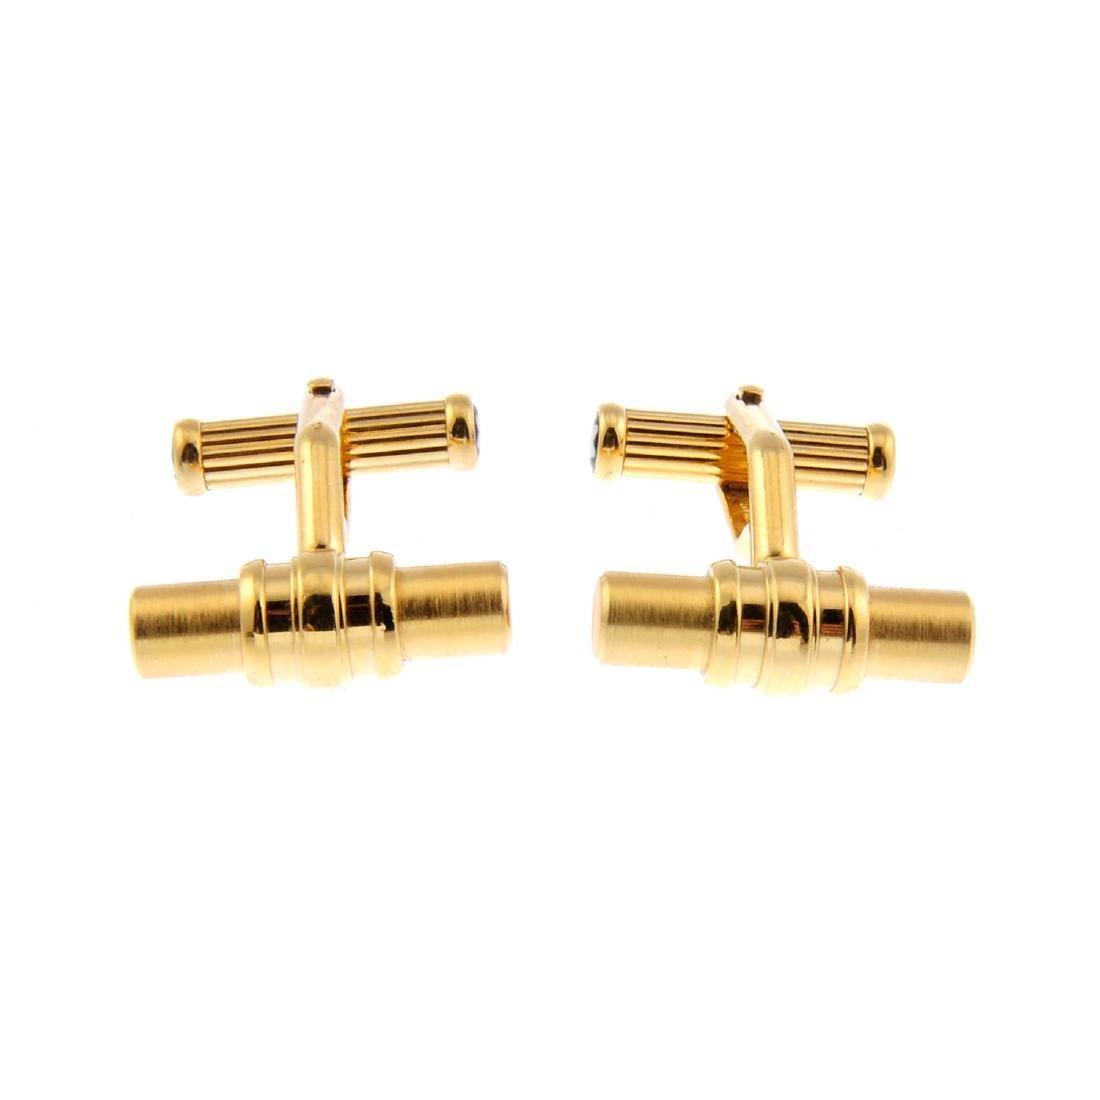 MONT BLANC - a pair of cufflinks. Each designed as